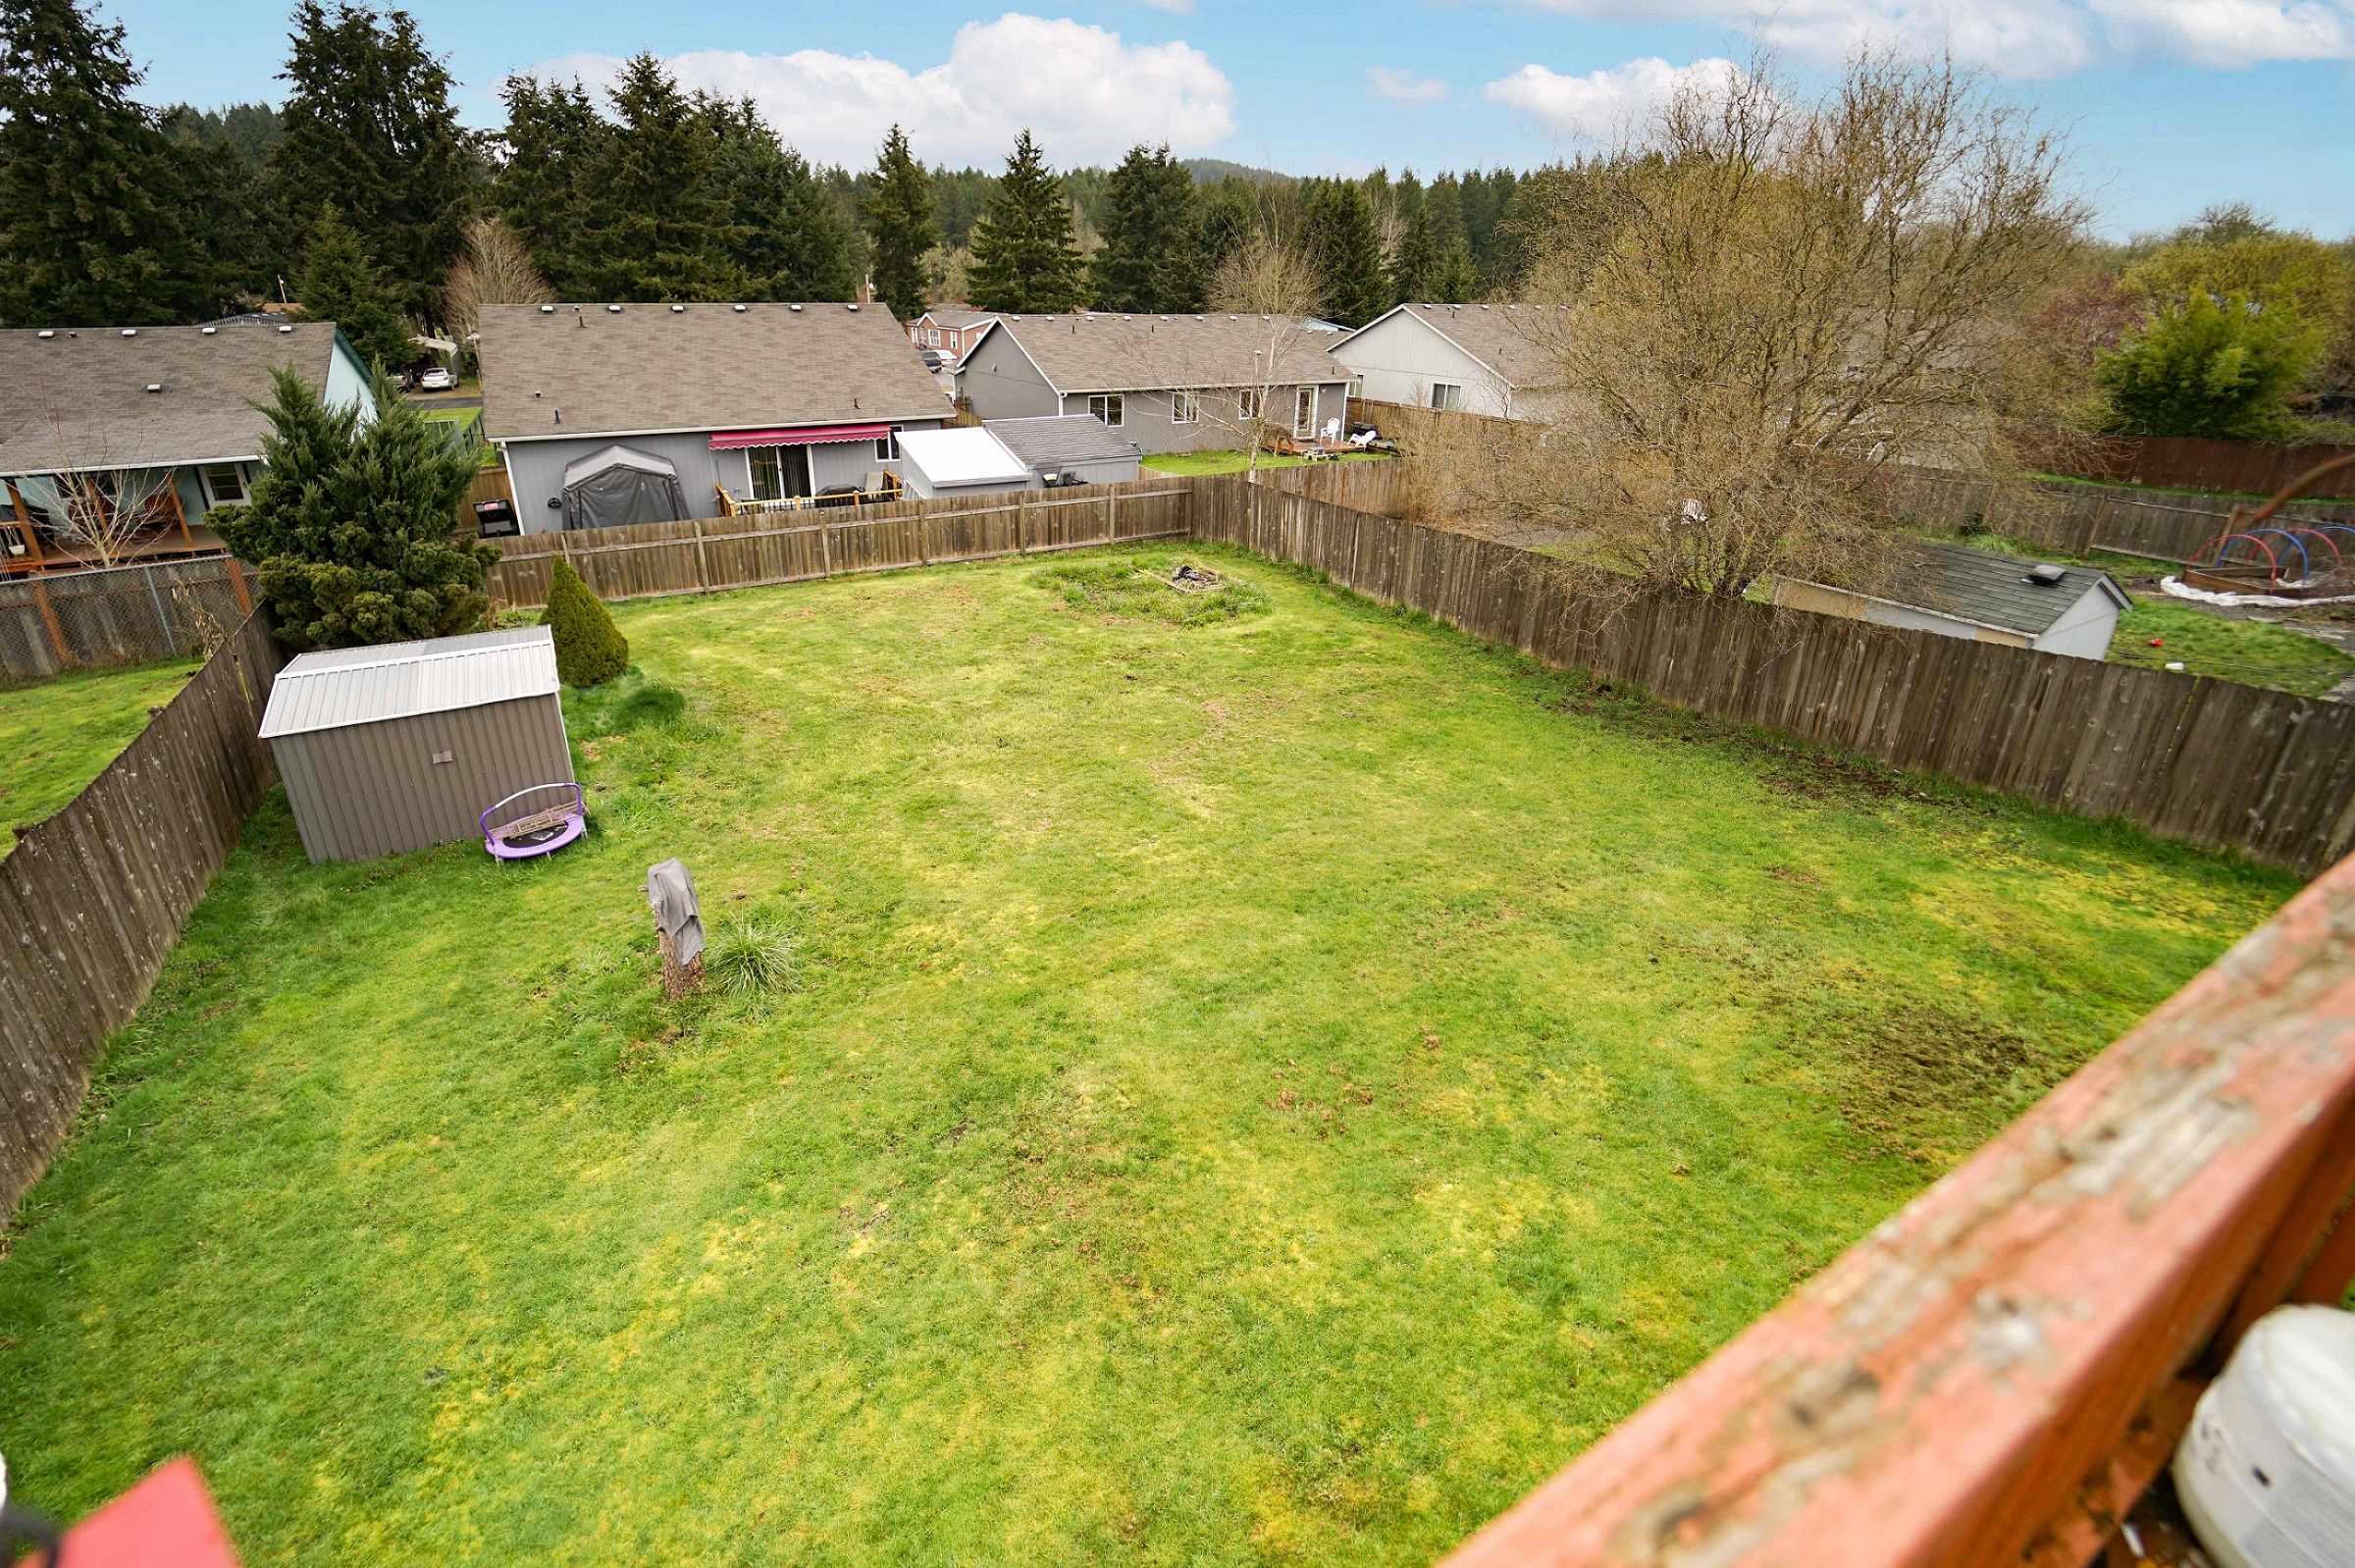 Backyard home for sale